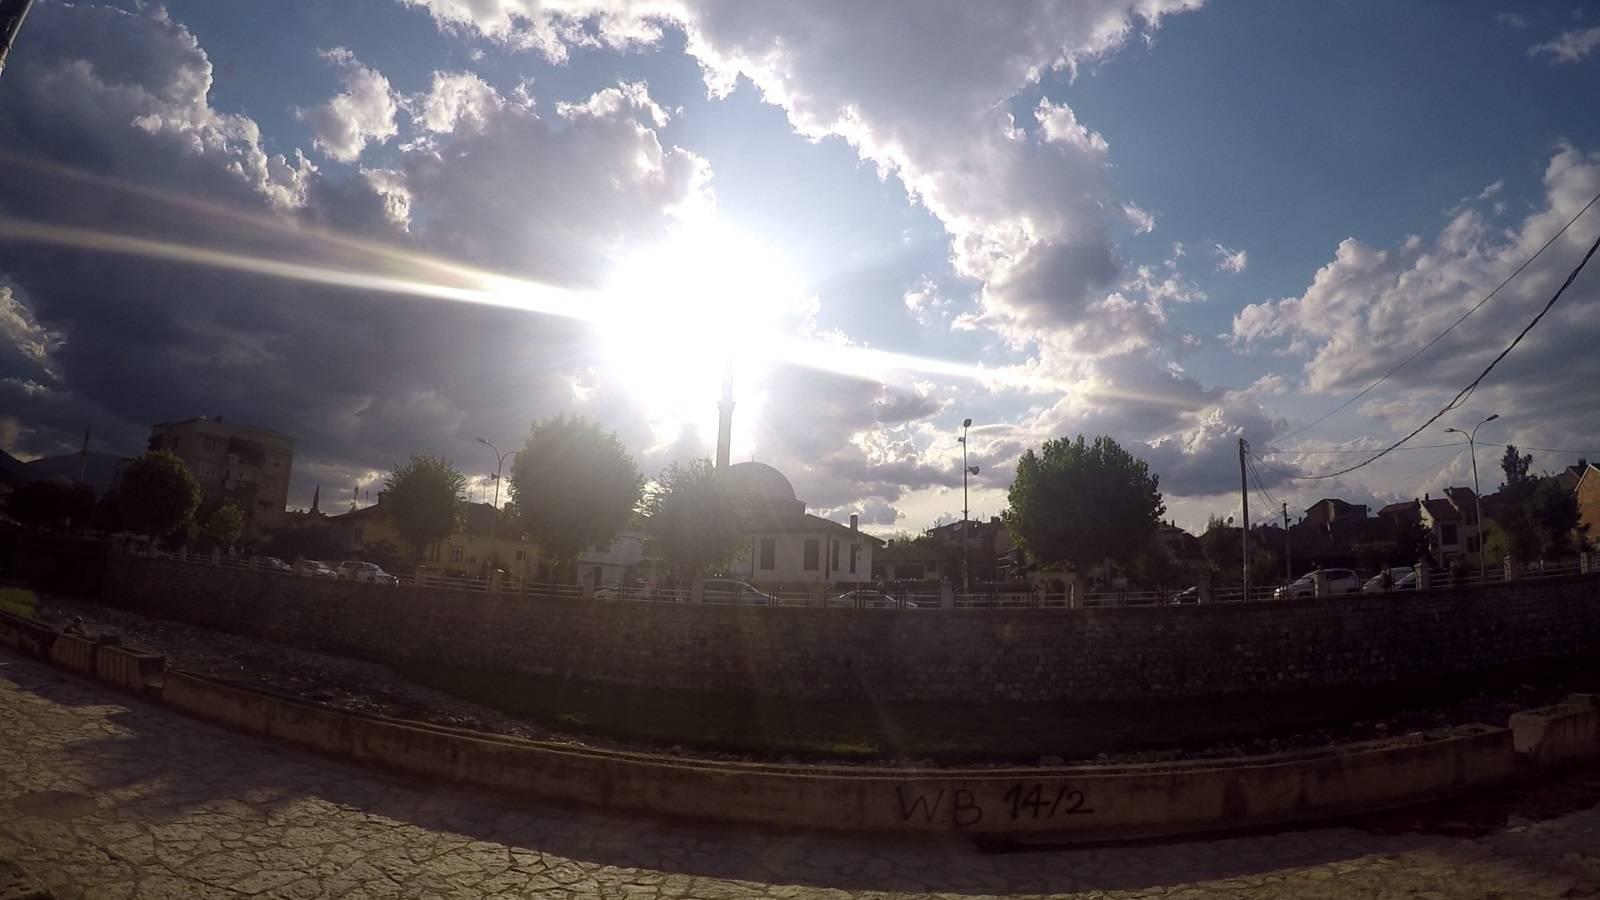 Photo 2: Prizren, petite ville accueillante du Kosovo